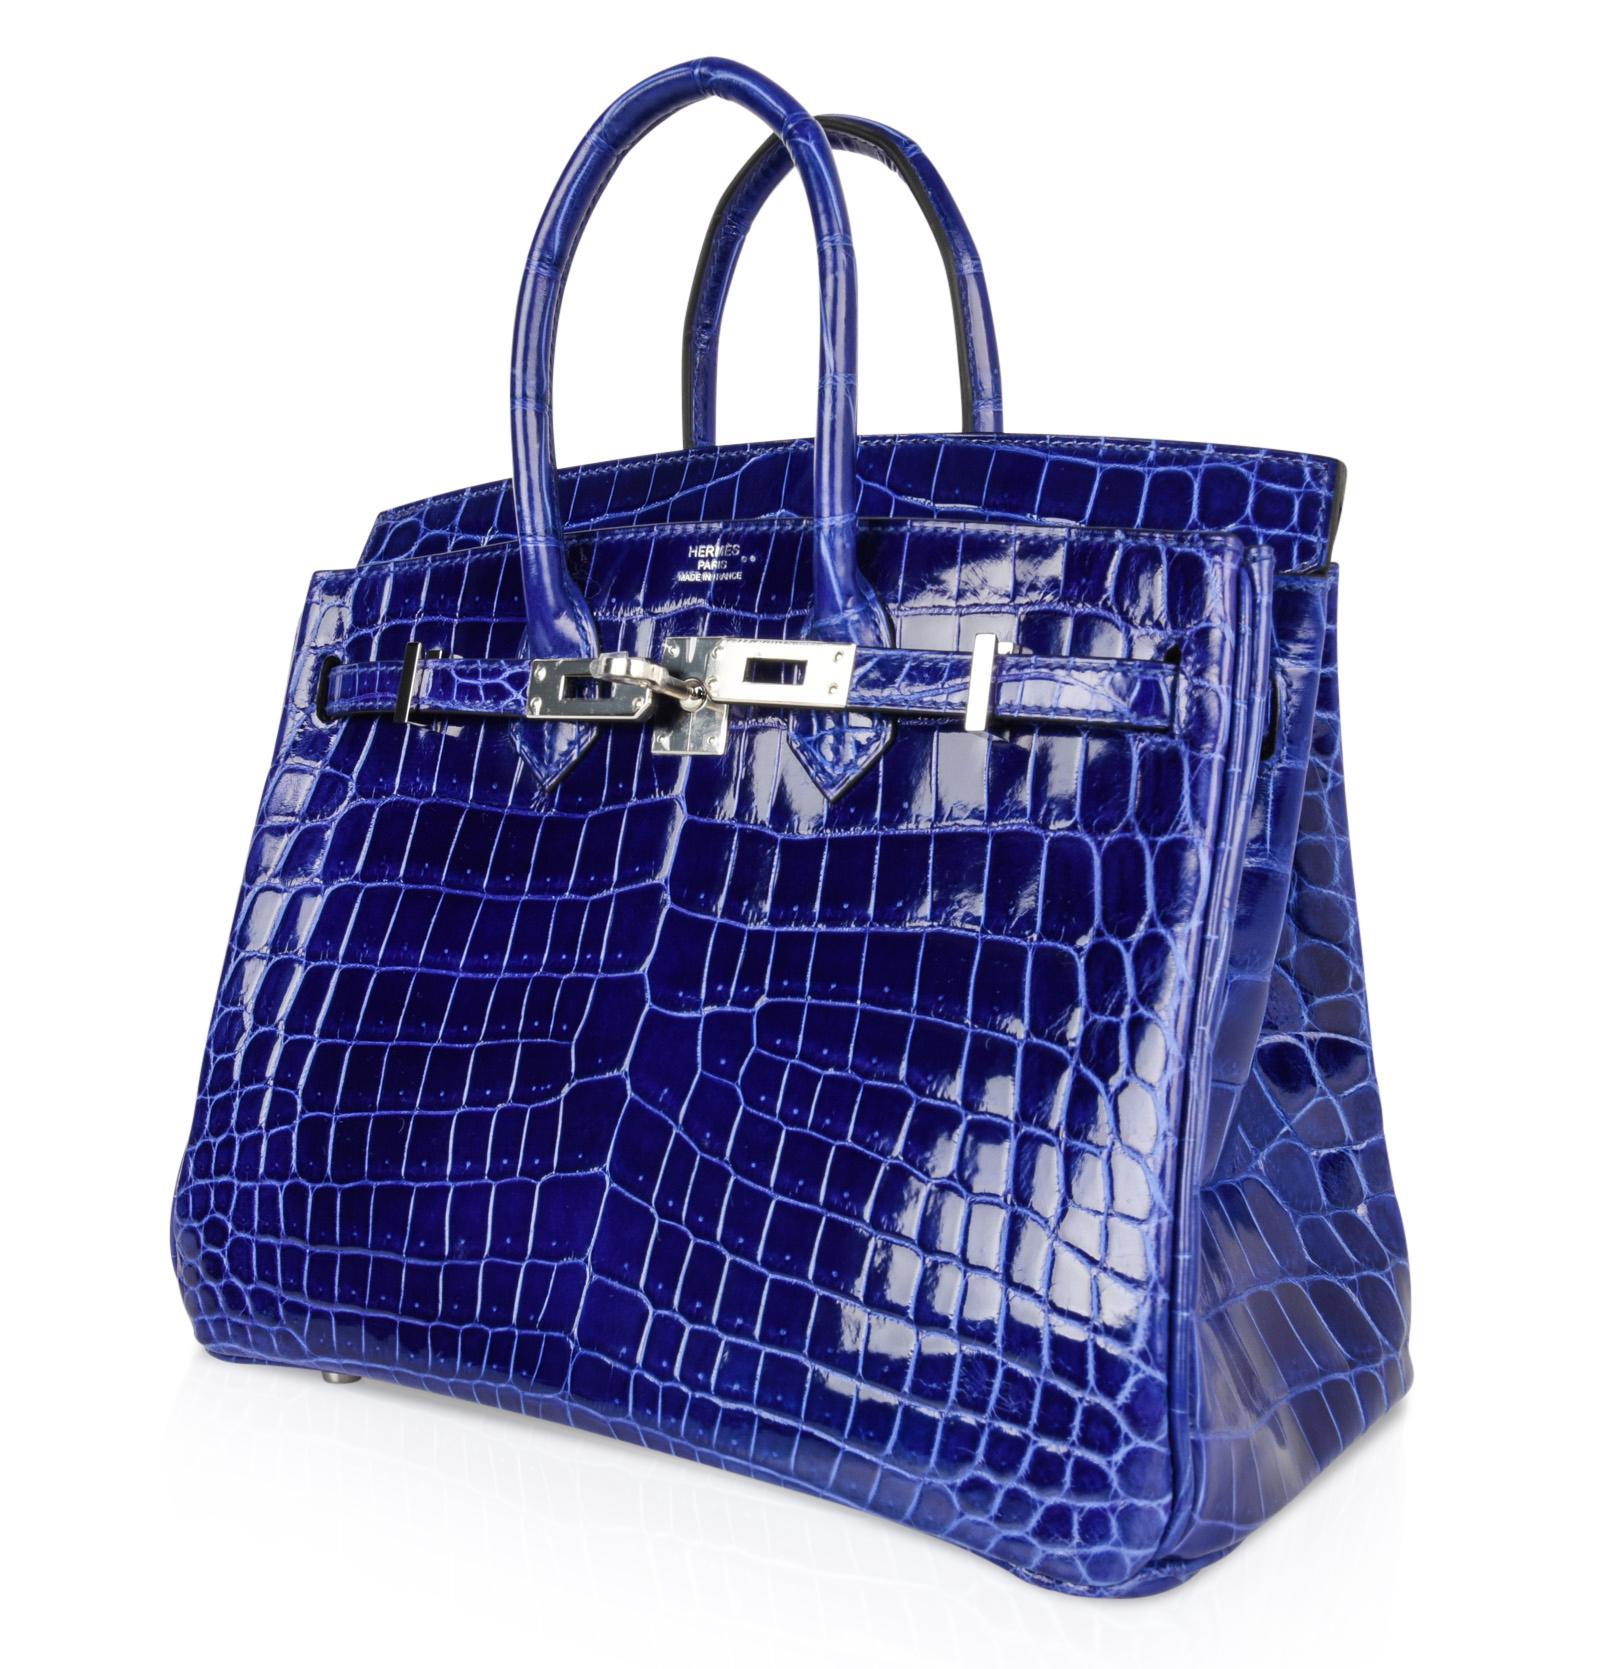 c11989cca6 Hermes Birkin 25 Bag Blue Electric Crocodile Vivid Jewel Palladium Hardware  For Sale at 1stdibs